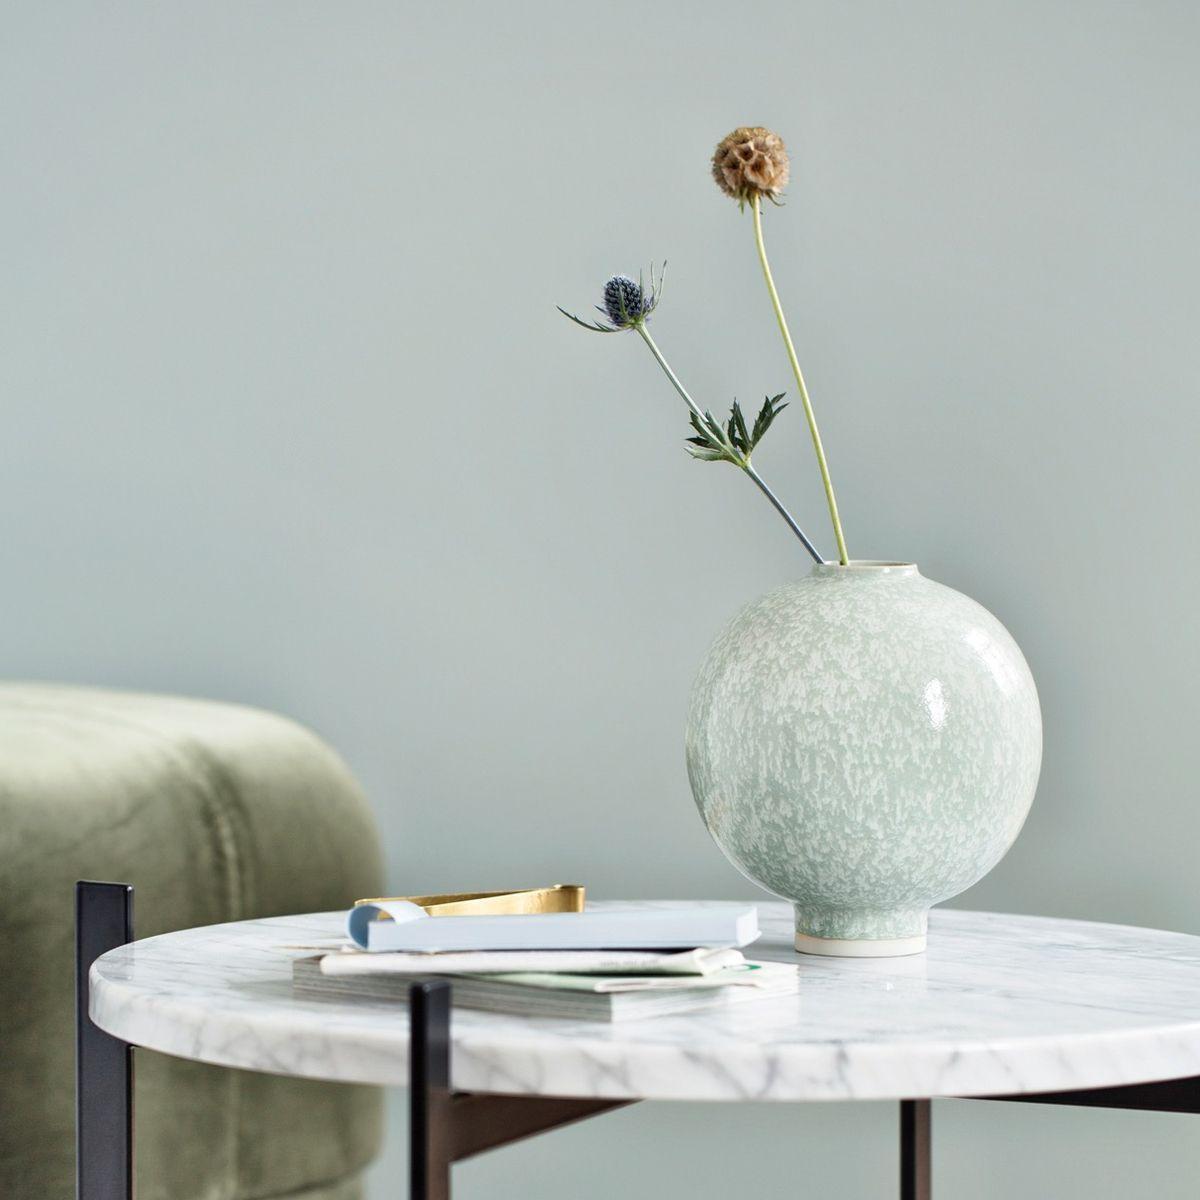 Kahler Unico Vase Large green on a marble side table